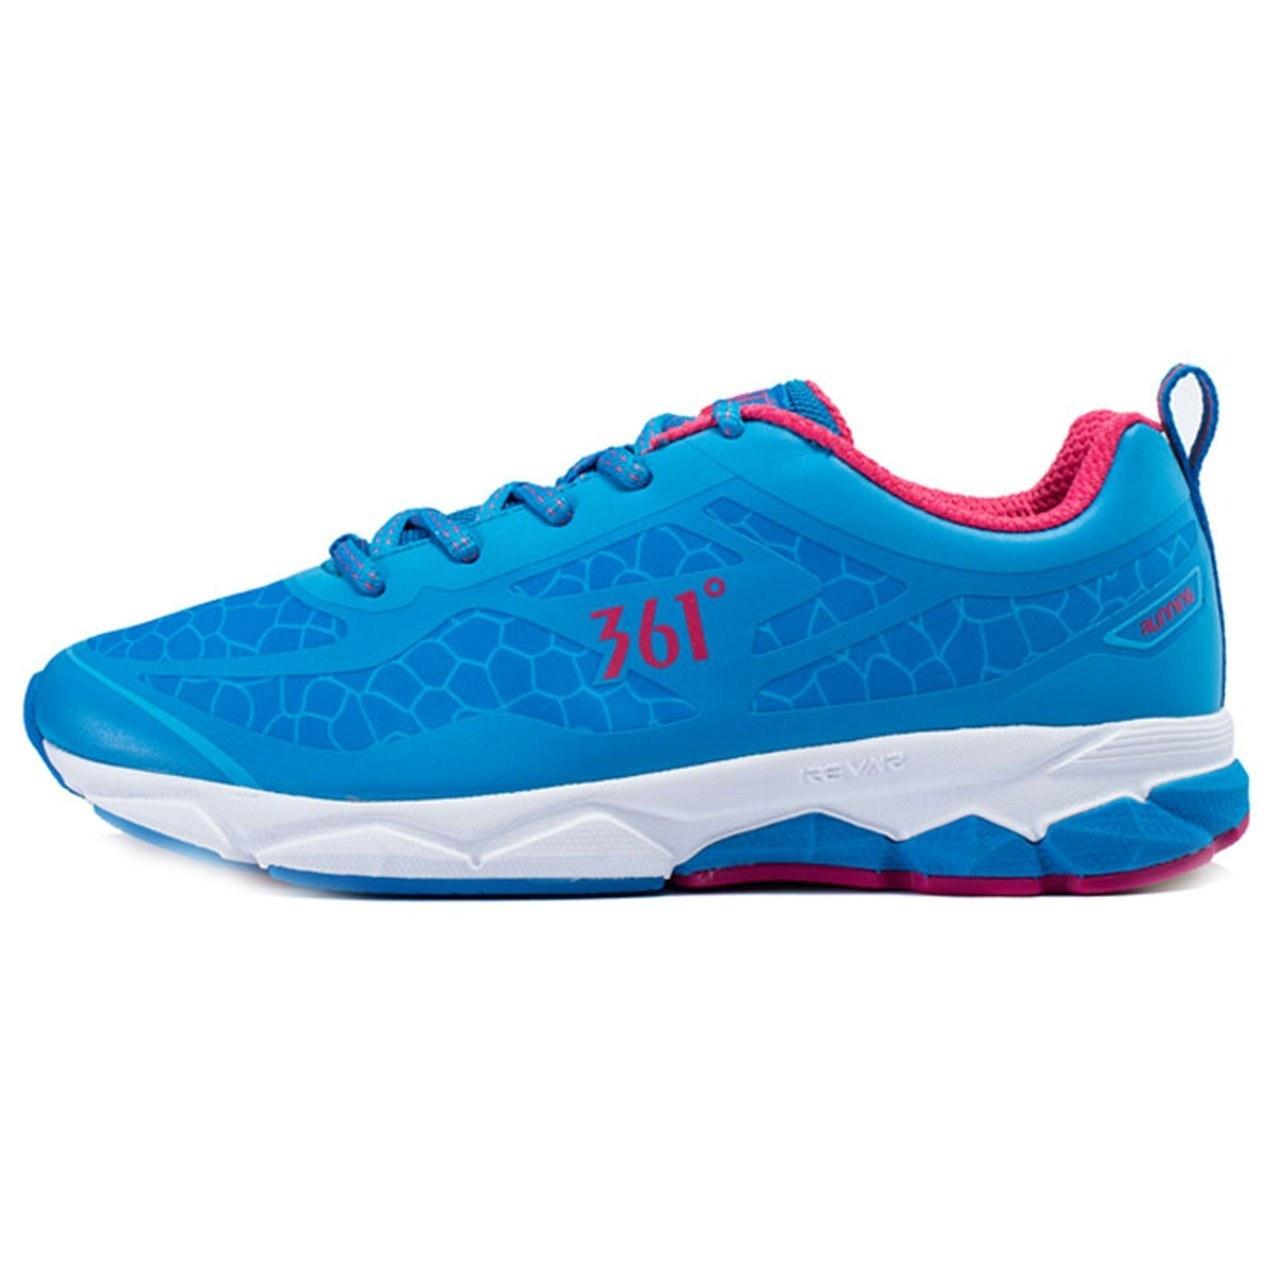 کفش مخصوص دويدن زنانه 361 درجه مدل 1019 | Model 1019 Running Shoes For Women By 361 Degrees